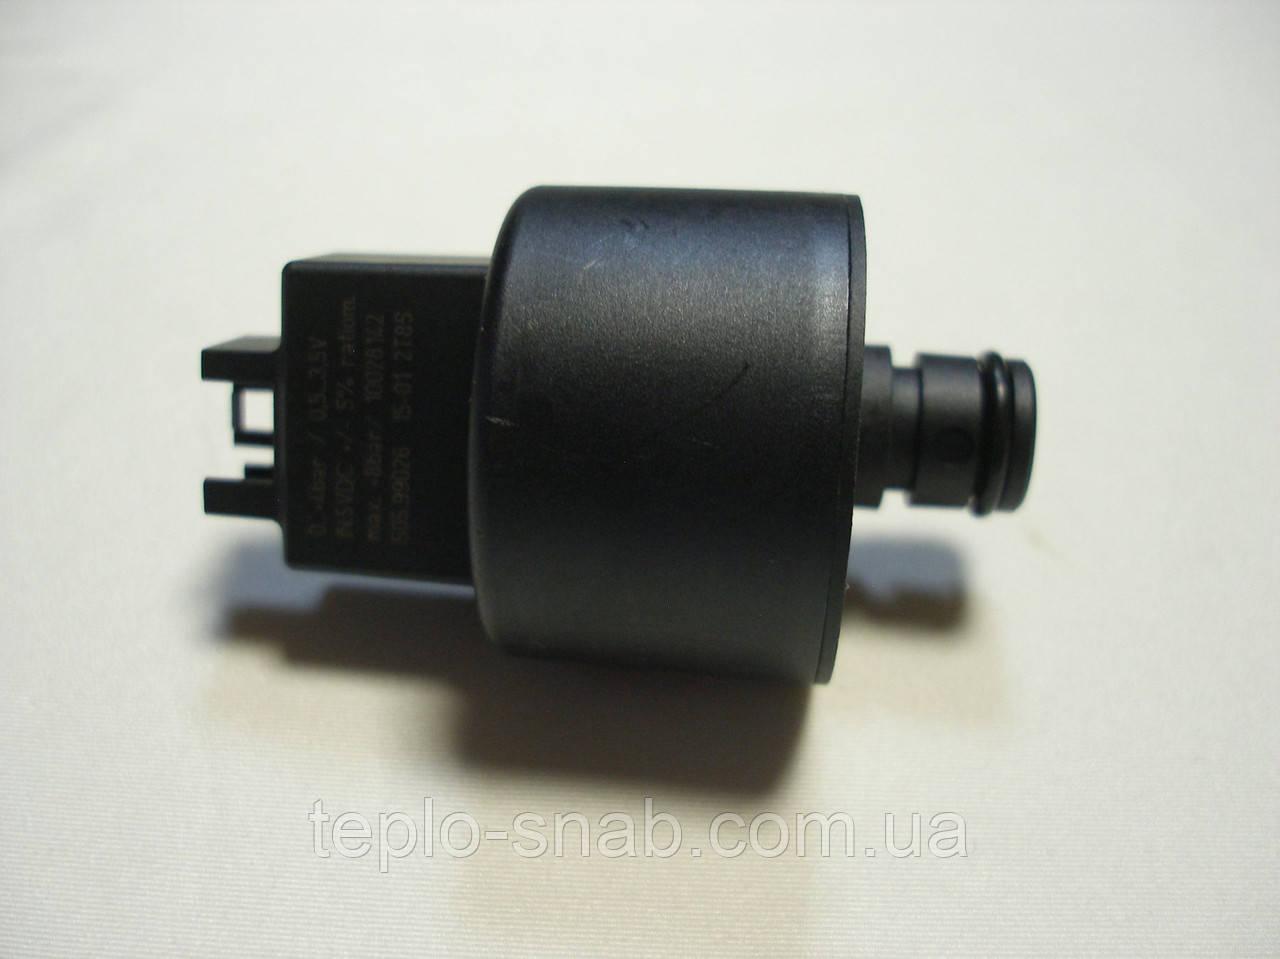 Датчик тиску Beretta Exclusive mix - R10028142